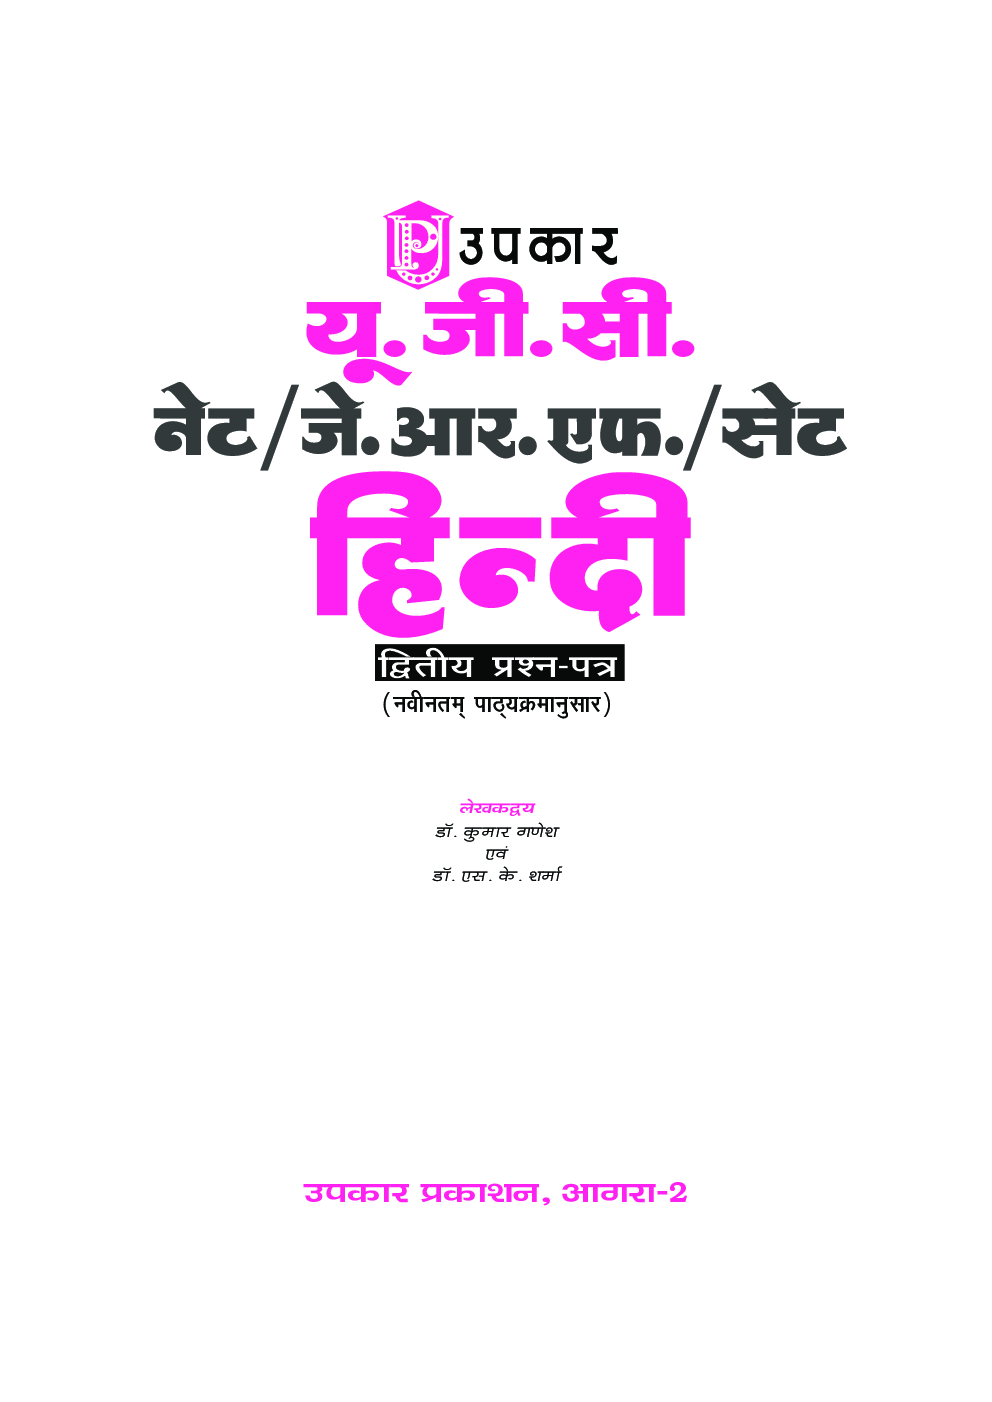 U.G.C. NET /J.R.F. /SET हिंदी (Paper-II) - Page 2